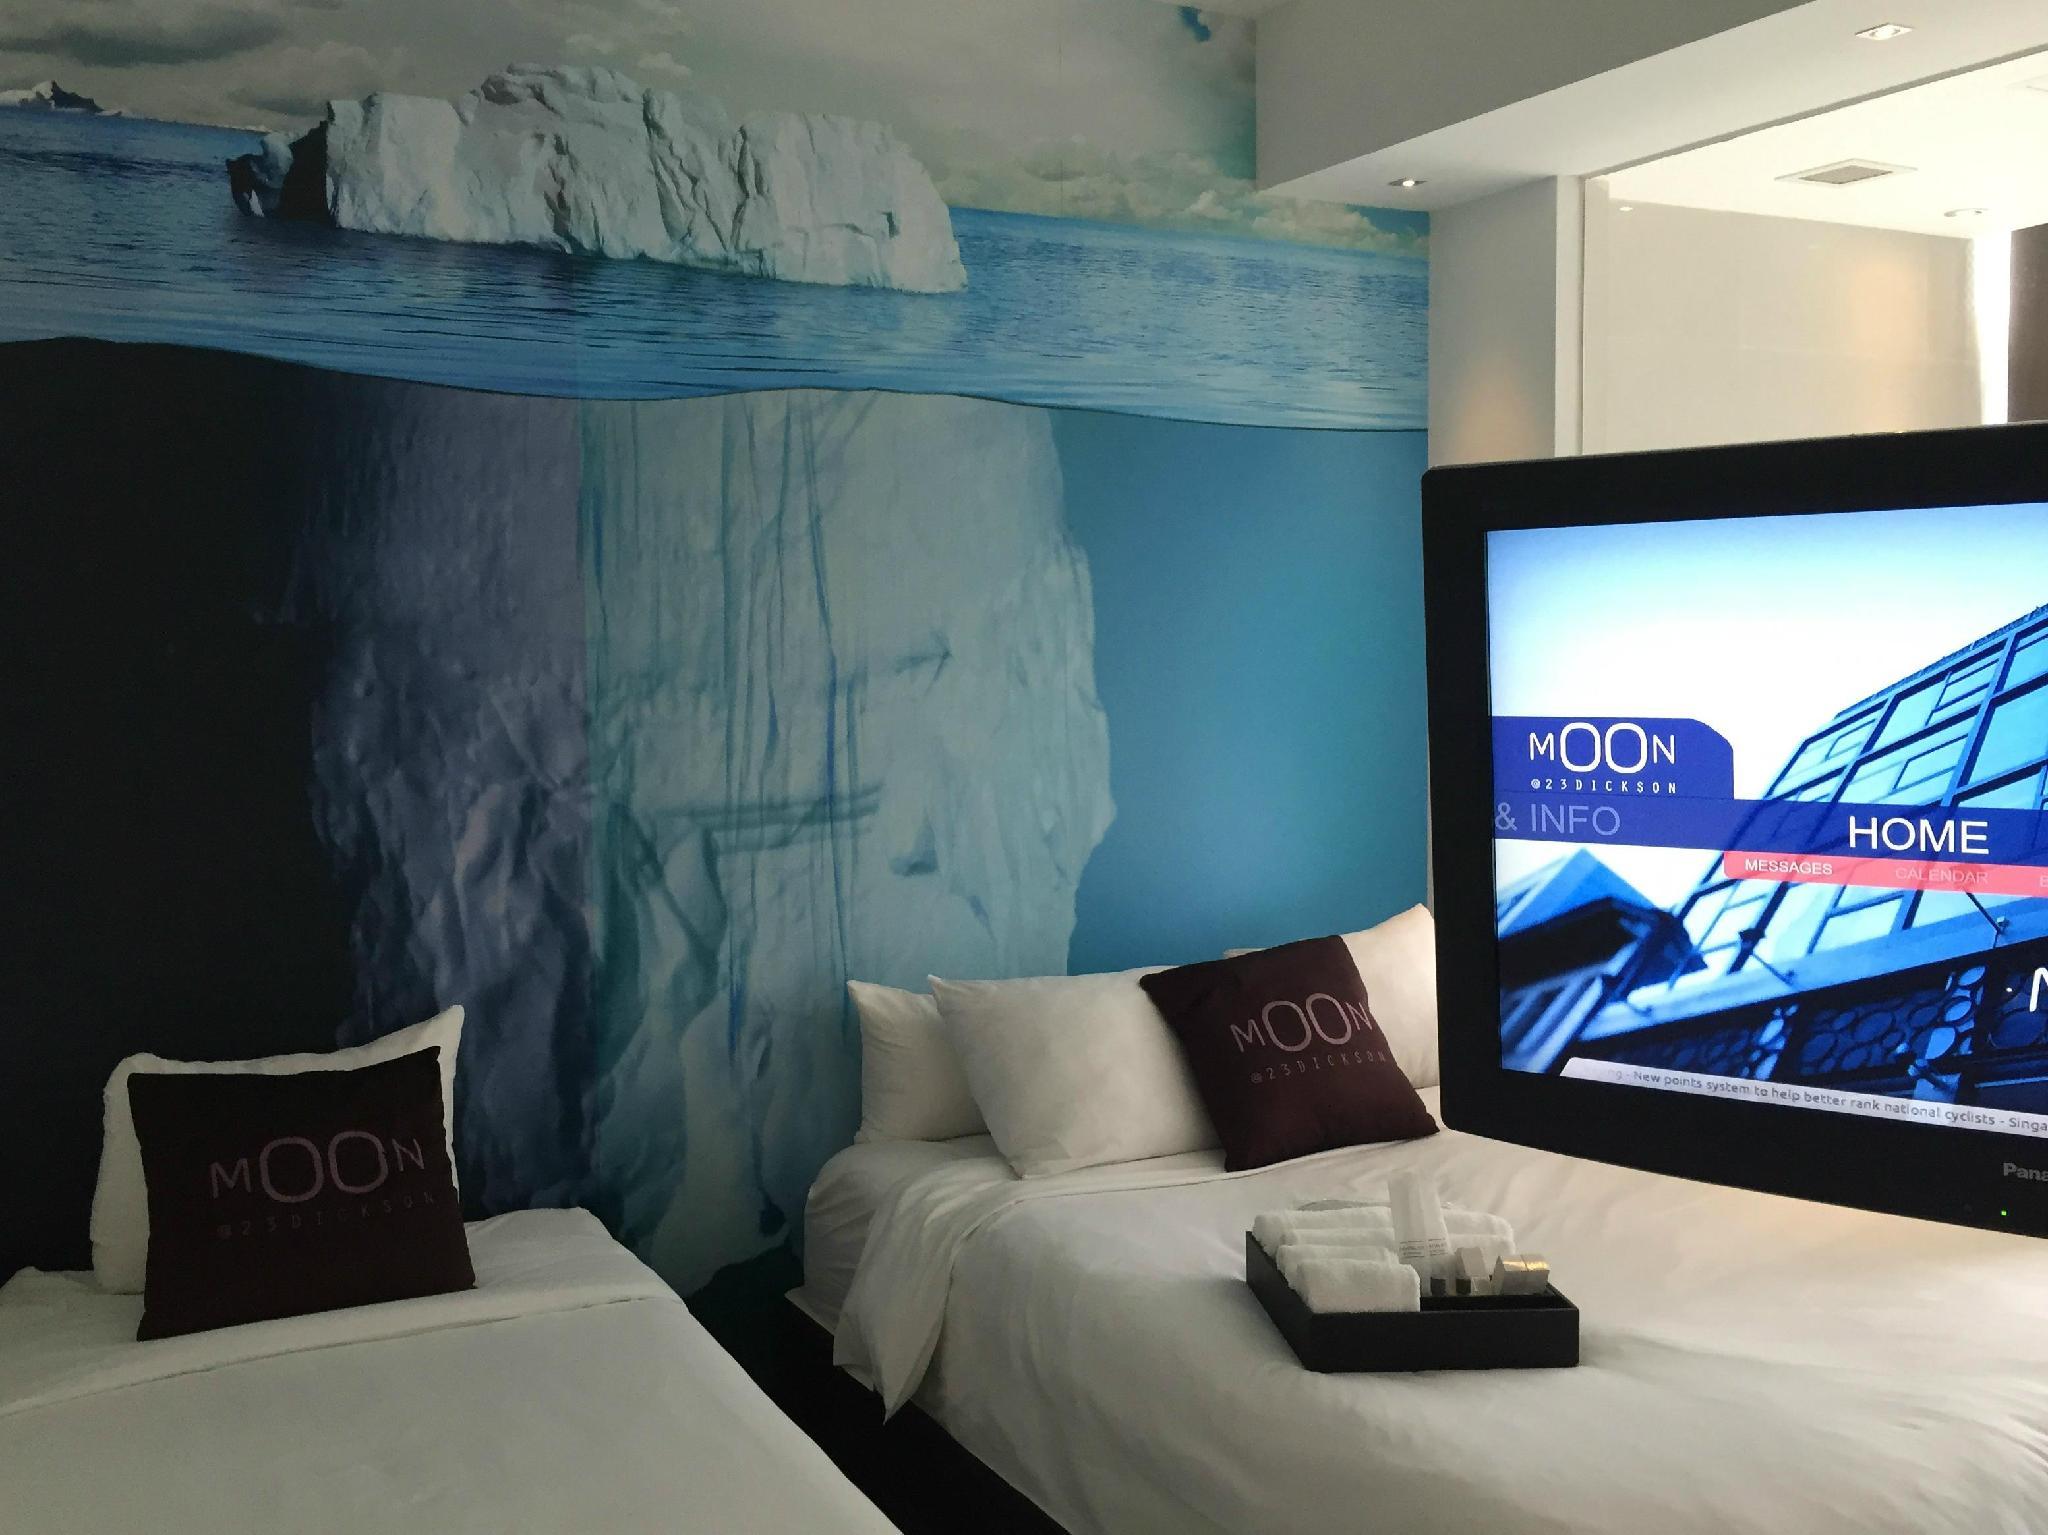 Moon Hotel Singapore | Moon @ 23 Dickson